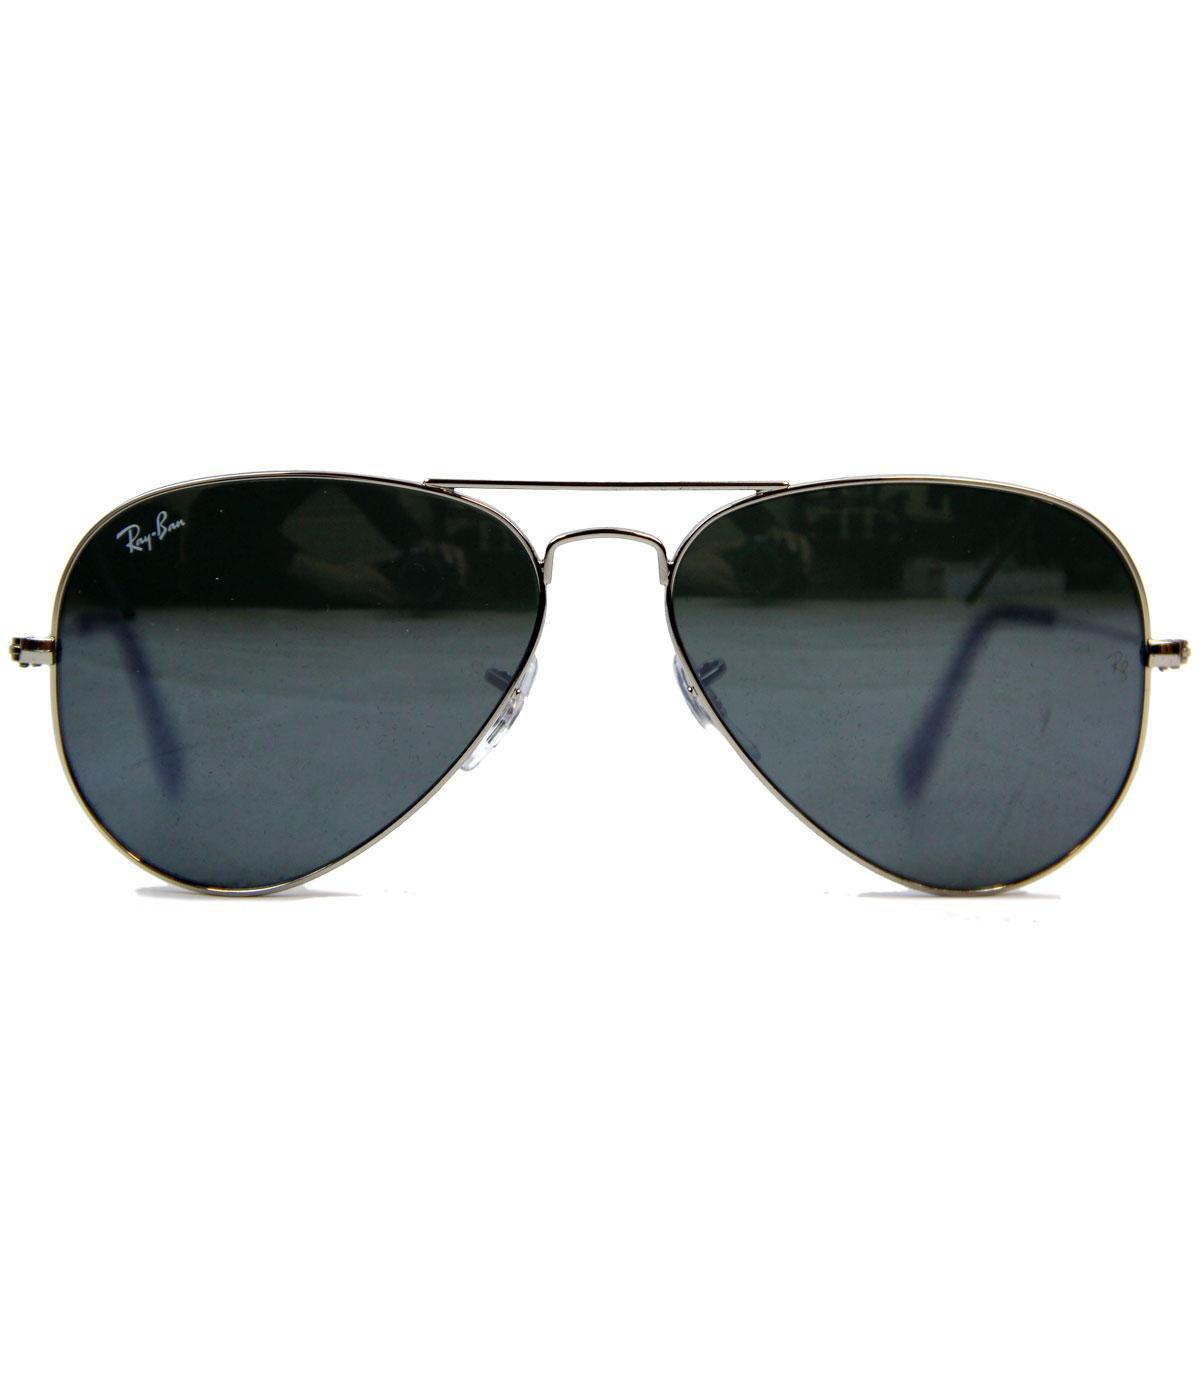 Ray ban aviator sunglasses in mirror lens retro icon for Ray ban aviator miroir